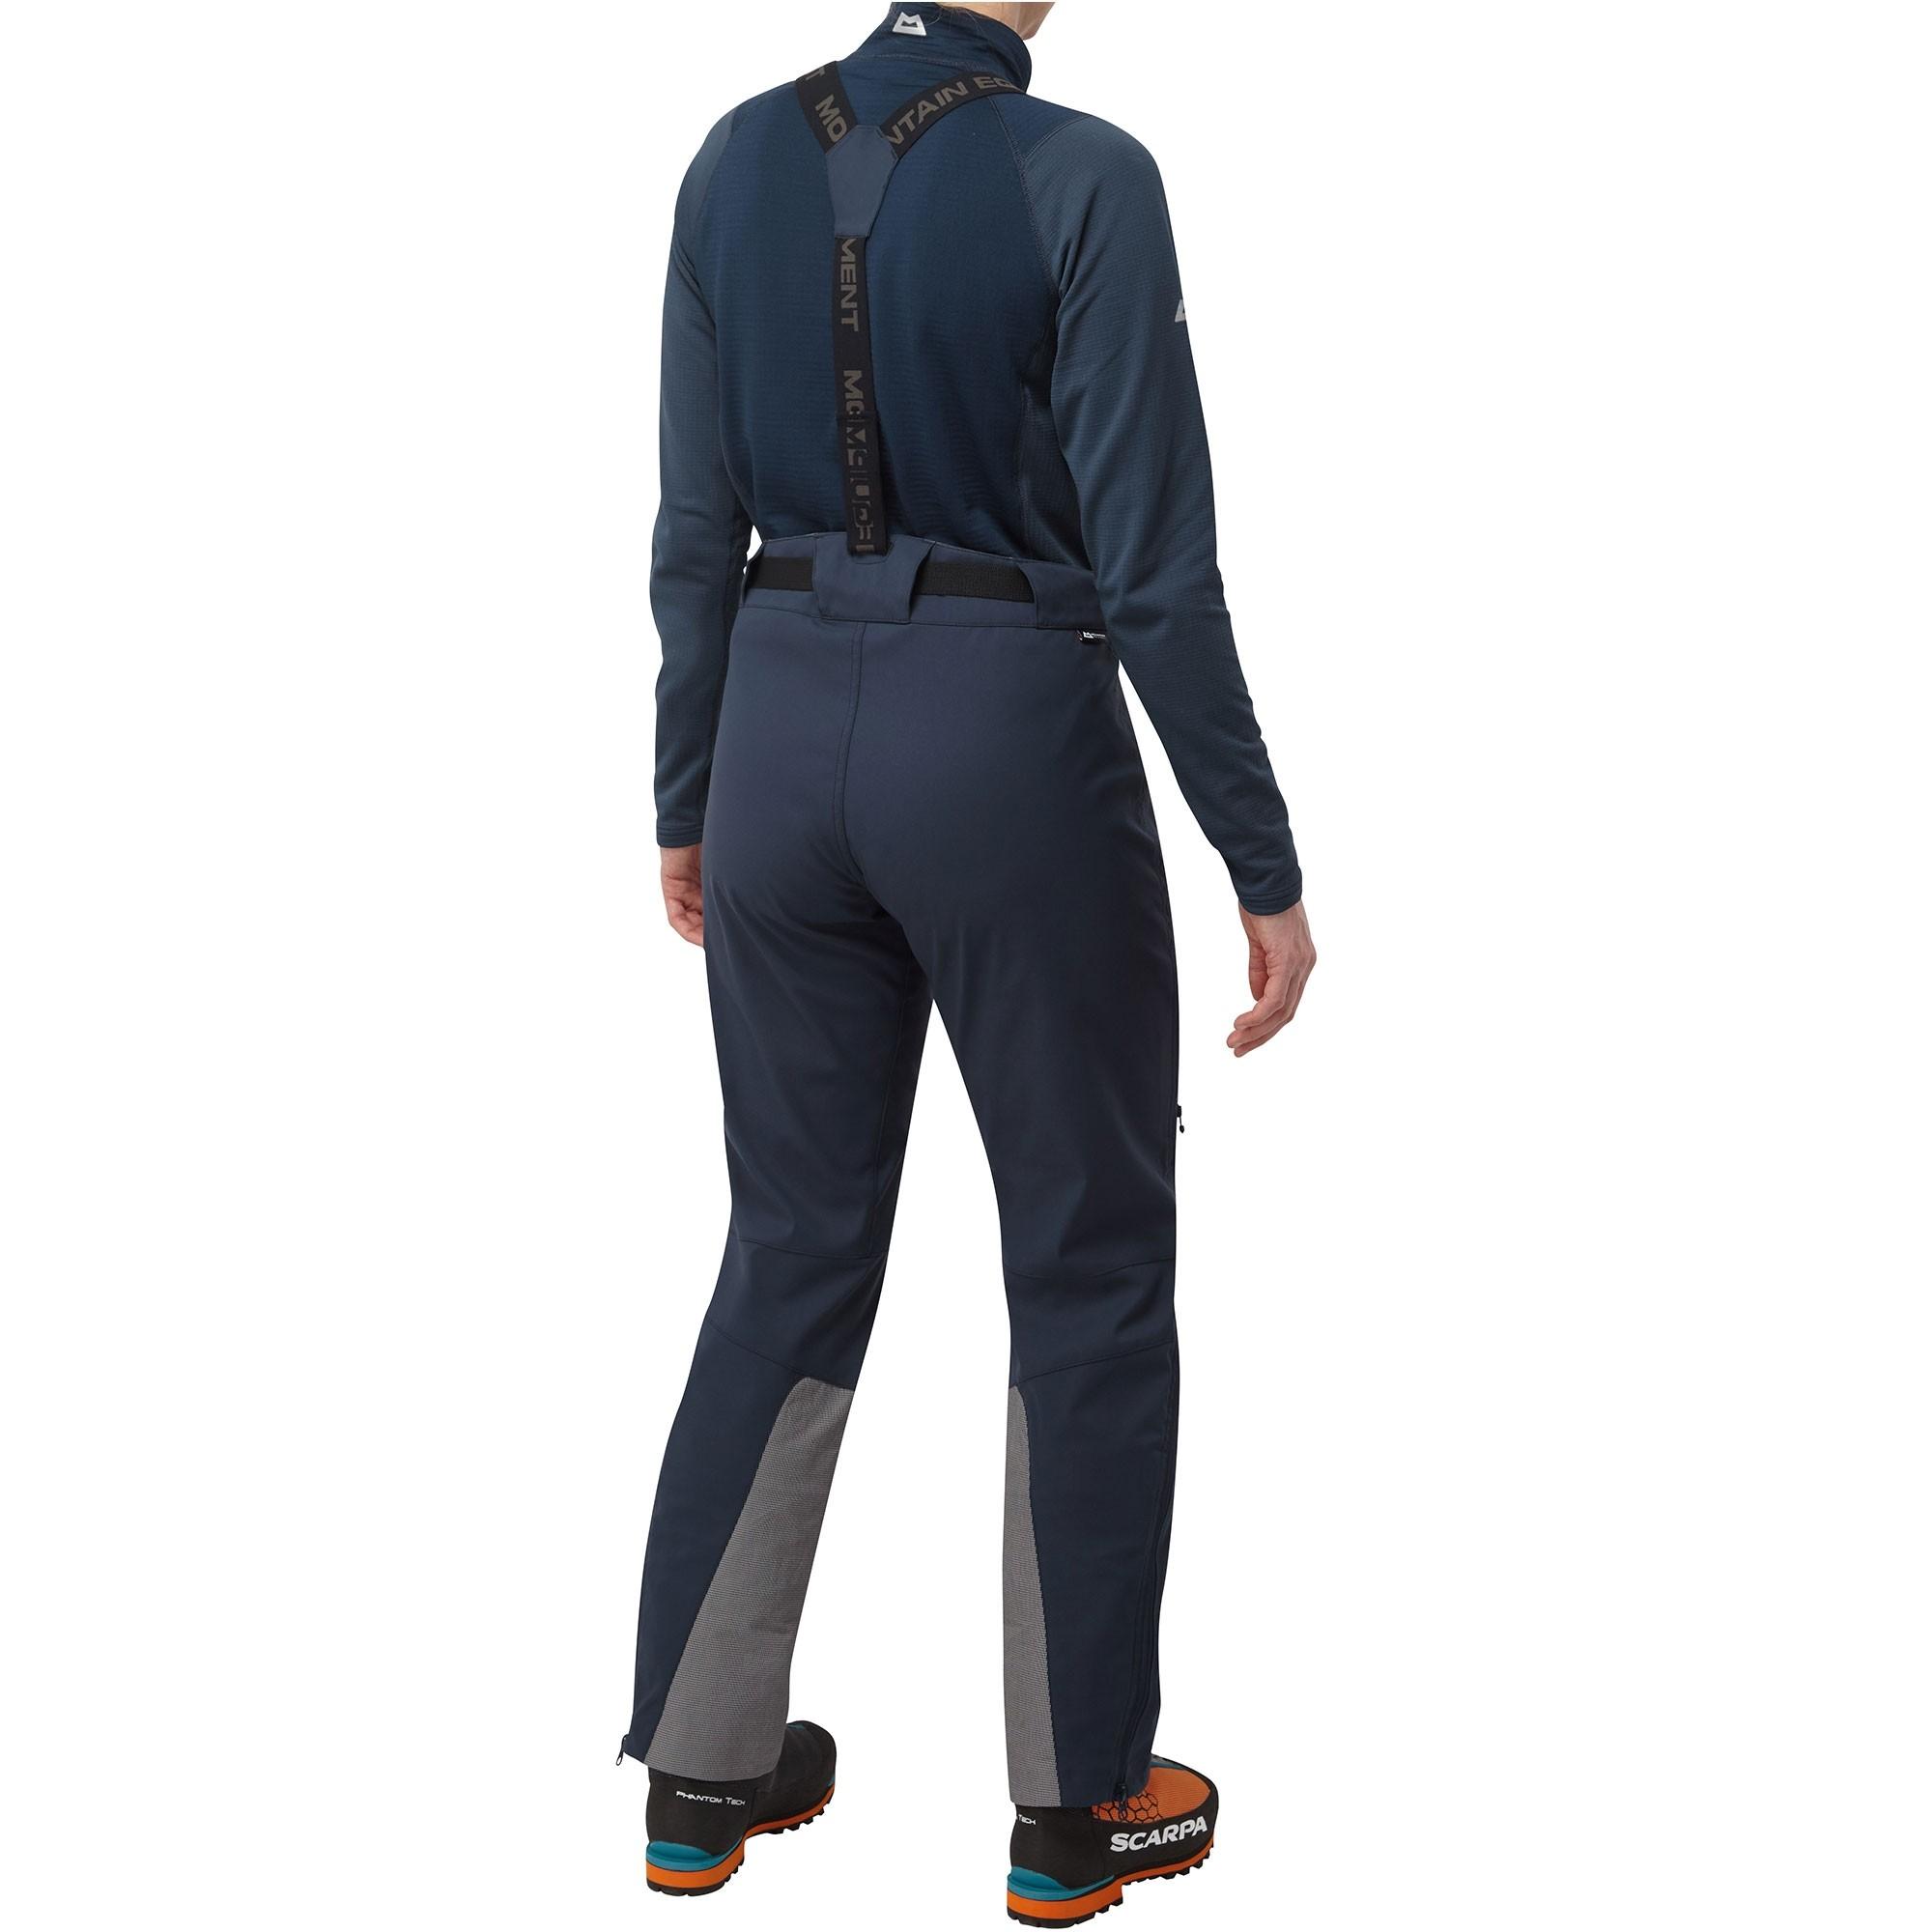 Mountain Equipment G2 Women's Mountain Pant - Cosmos - back